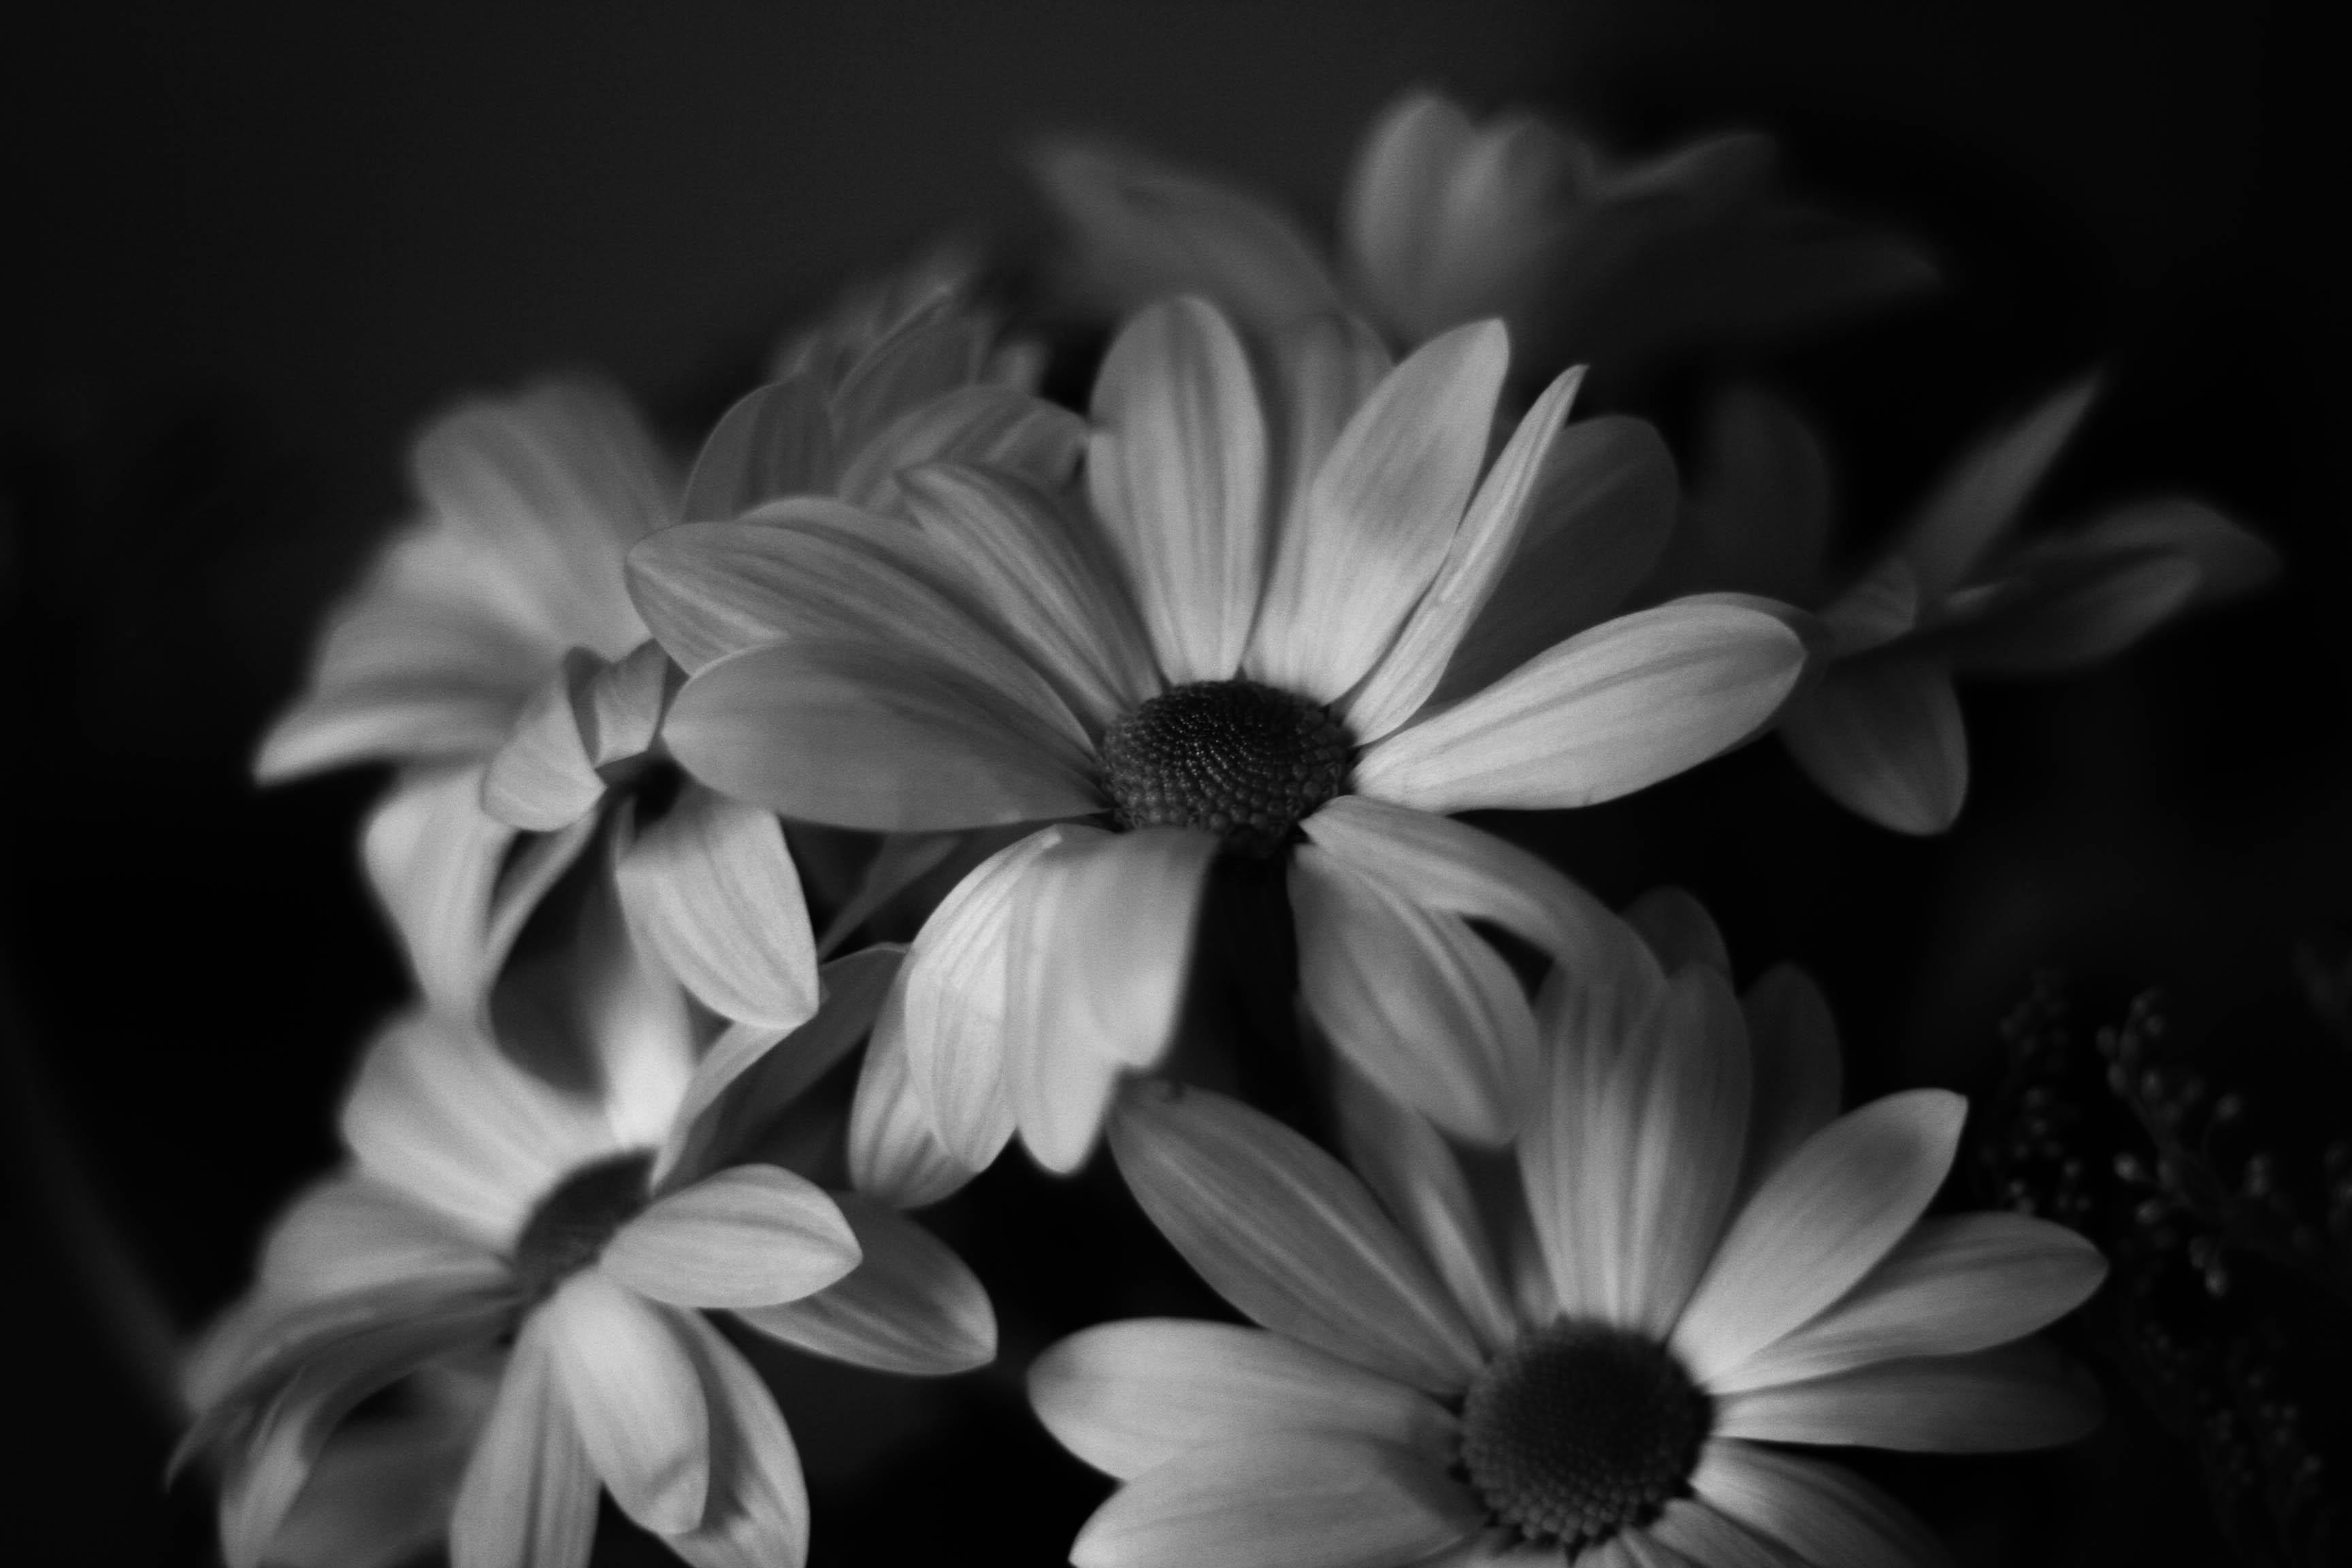 Wallpaper : flowers, white, black, film, monochrome, daisies